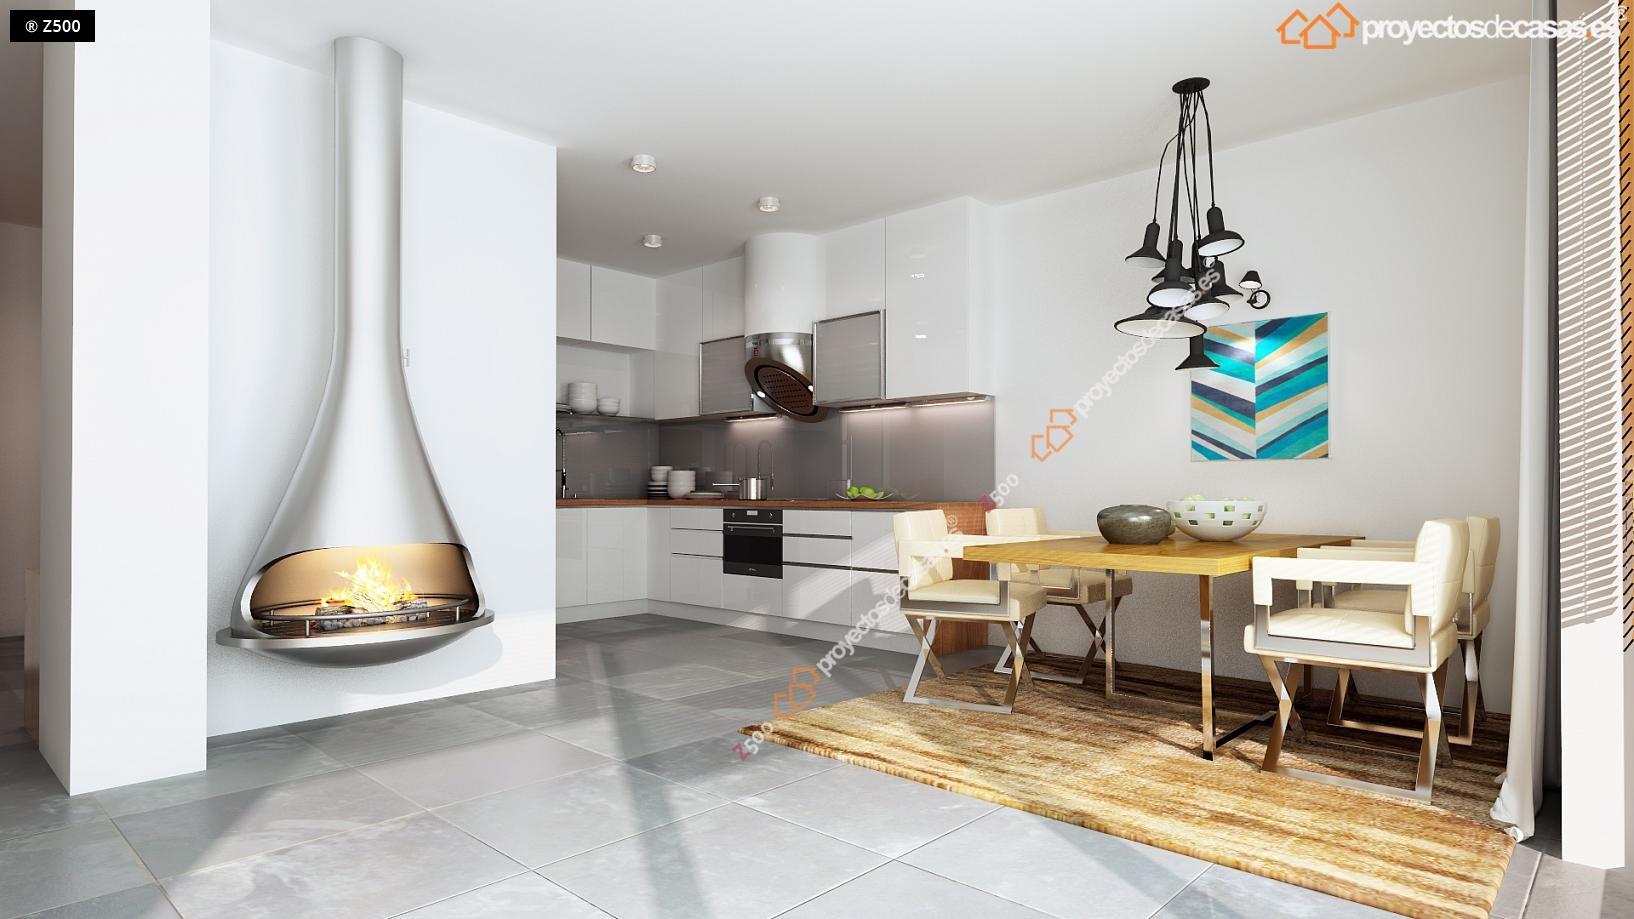 Proyectos de Casas | Boadilla de Monte Casa Adosada Moderna de ...